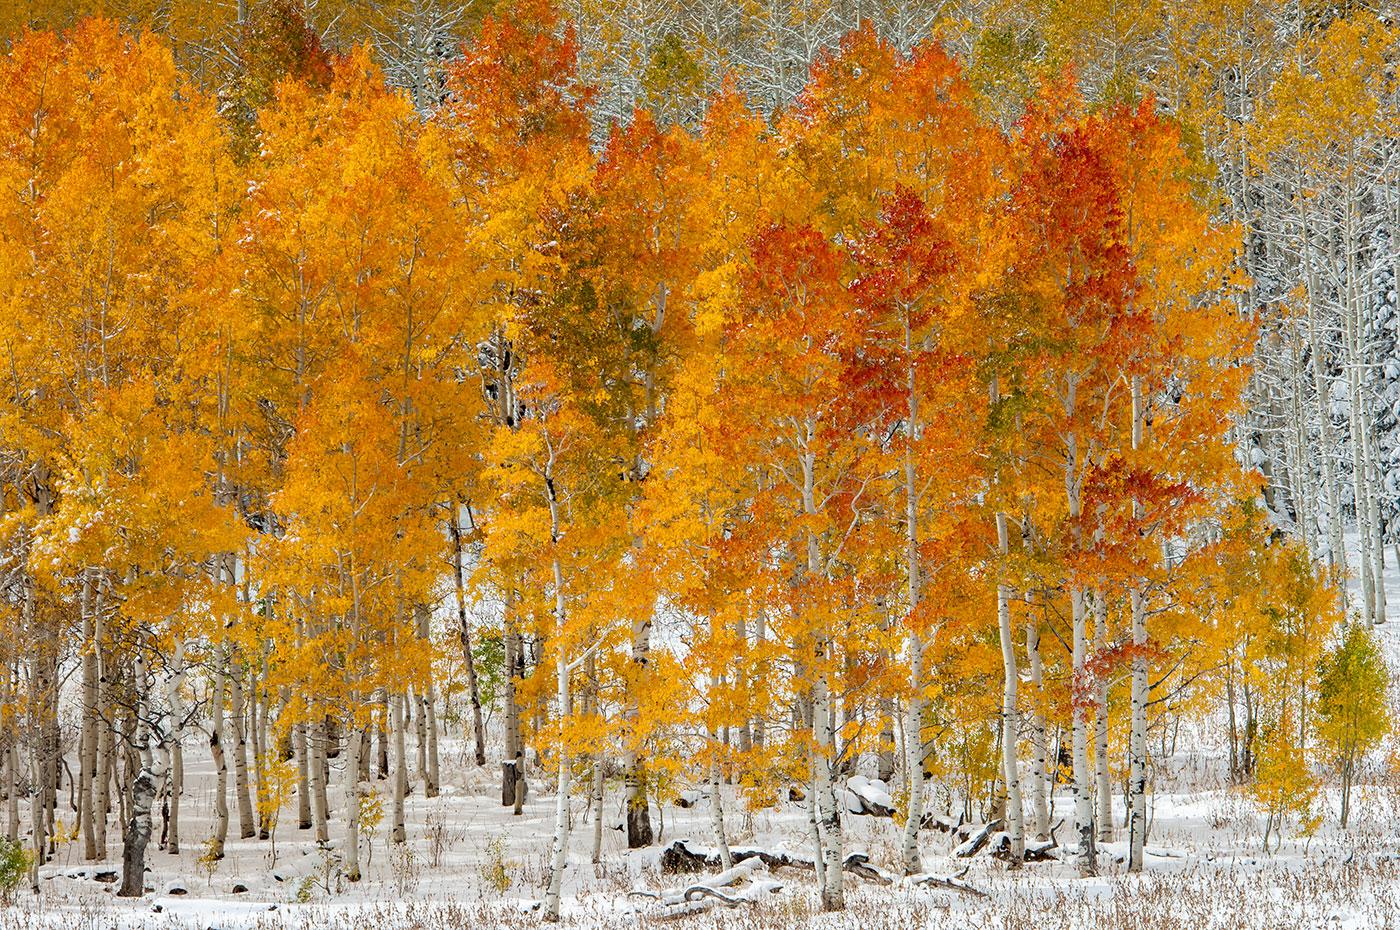 Autumn in the Uinta Mountains of UT - Image #3-5531